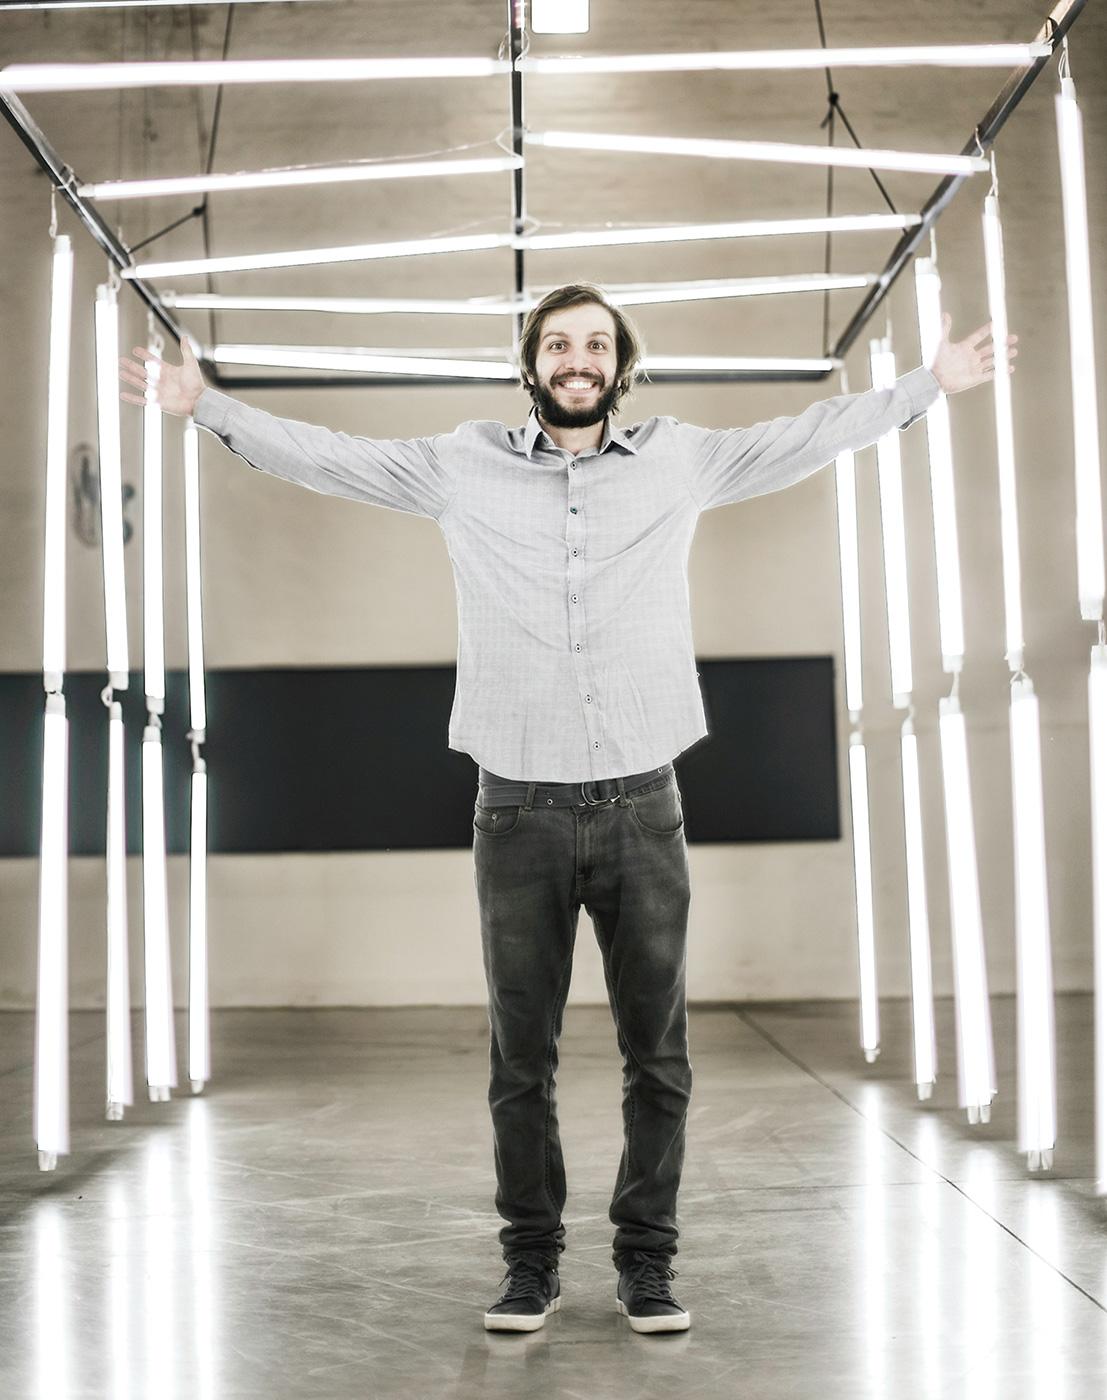 Guilherme Palmerio, artista visual